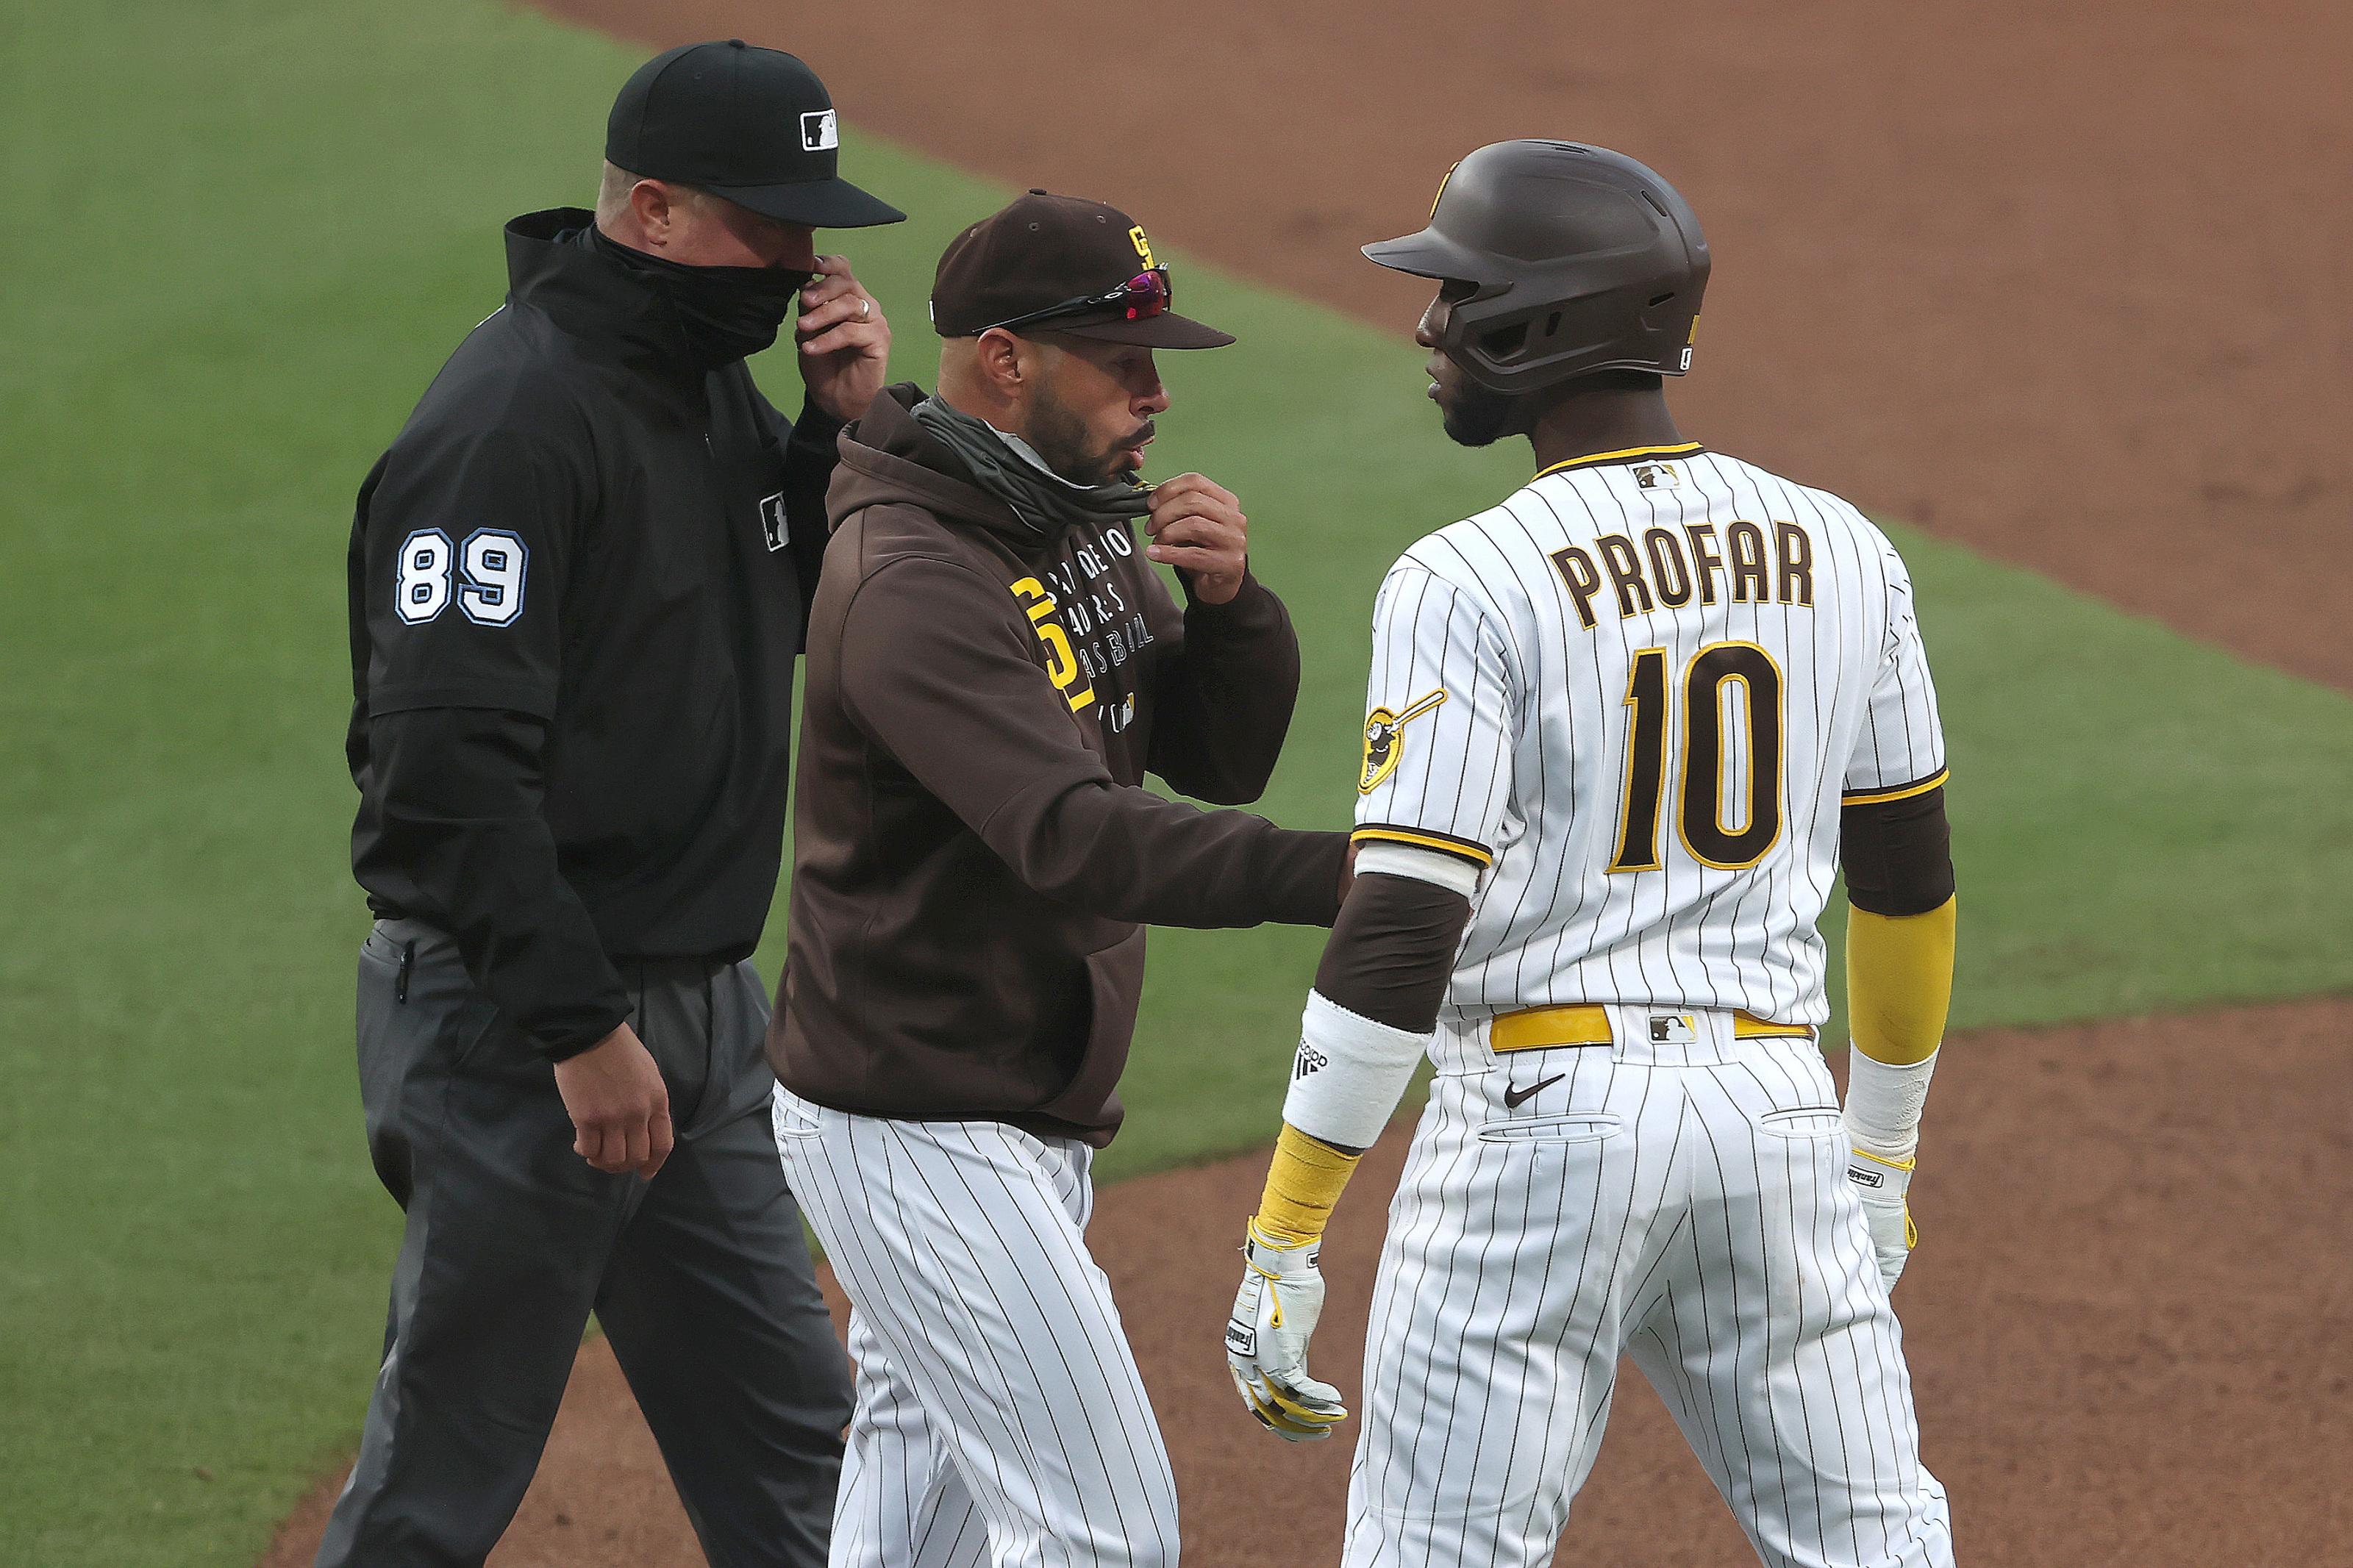 Padres announcer has hilarious interpretation of Clayton Kershaw-Jurickson  Profar beef (Video)